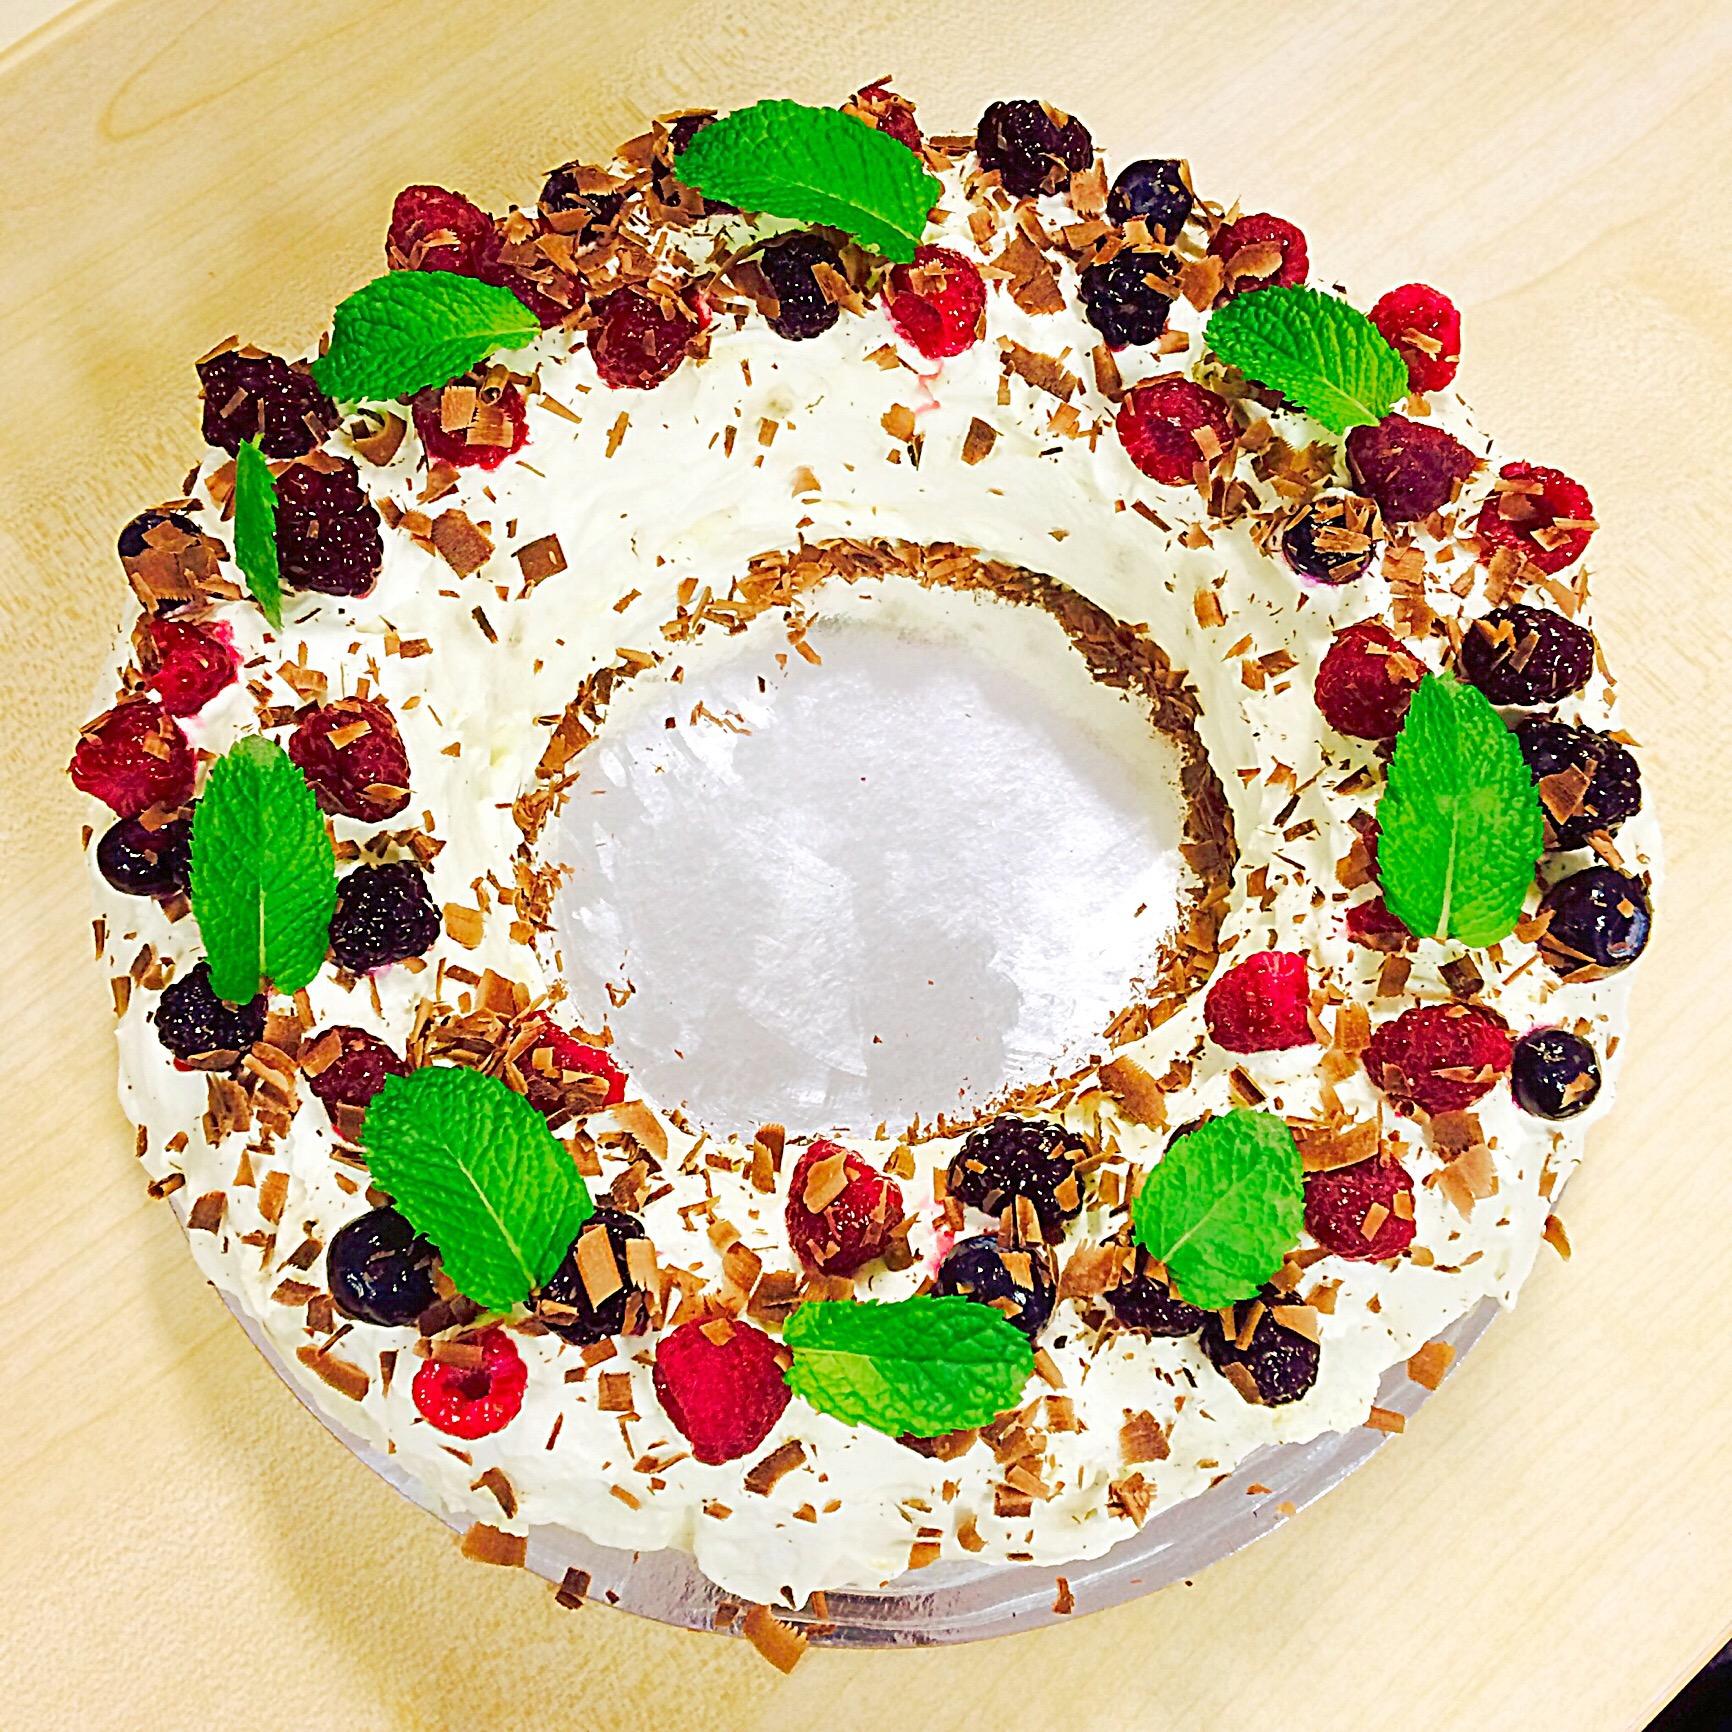 Choc ripple + butternut snap cookie Xmas wreath | tinman's treats